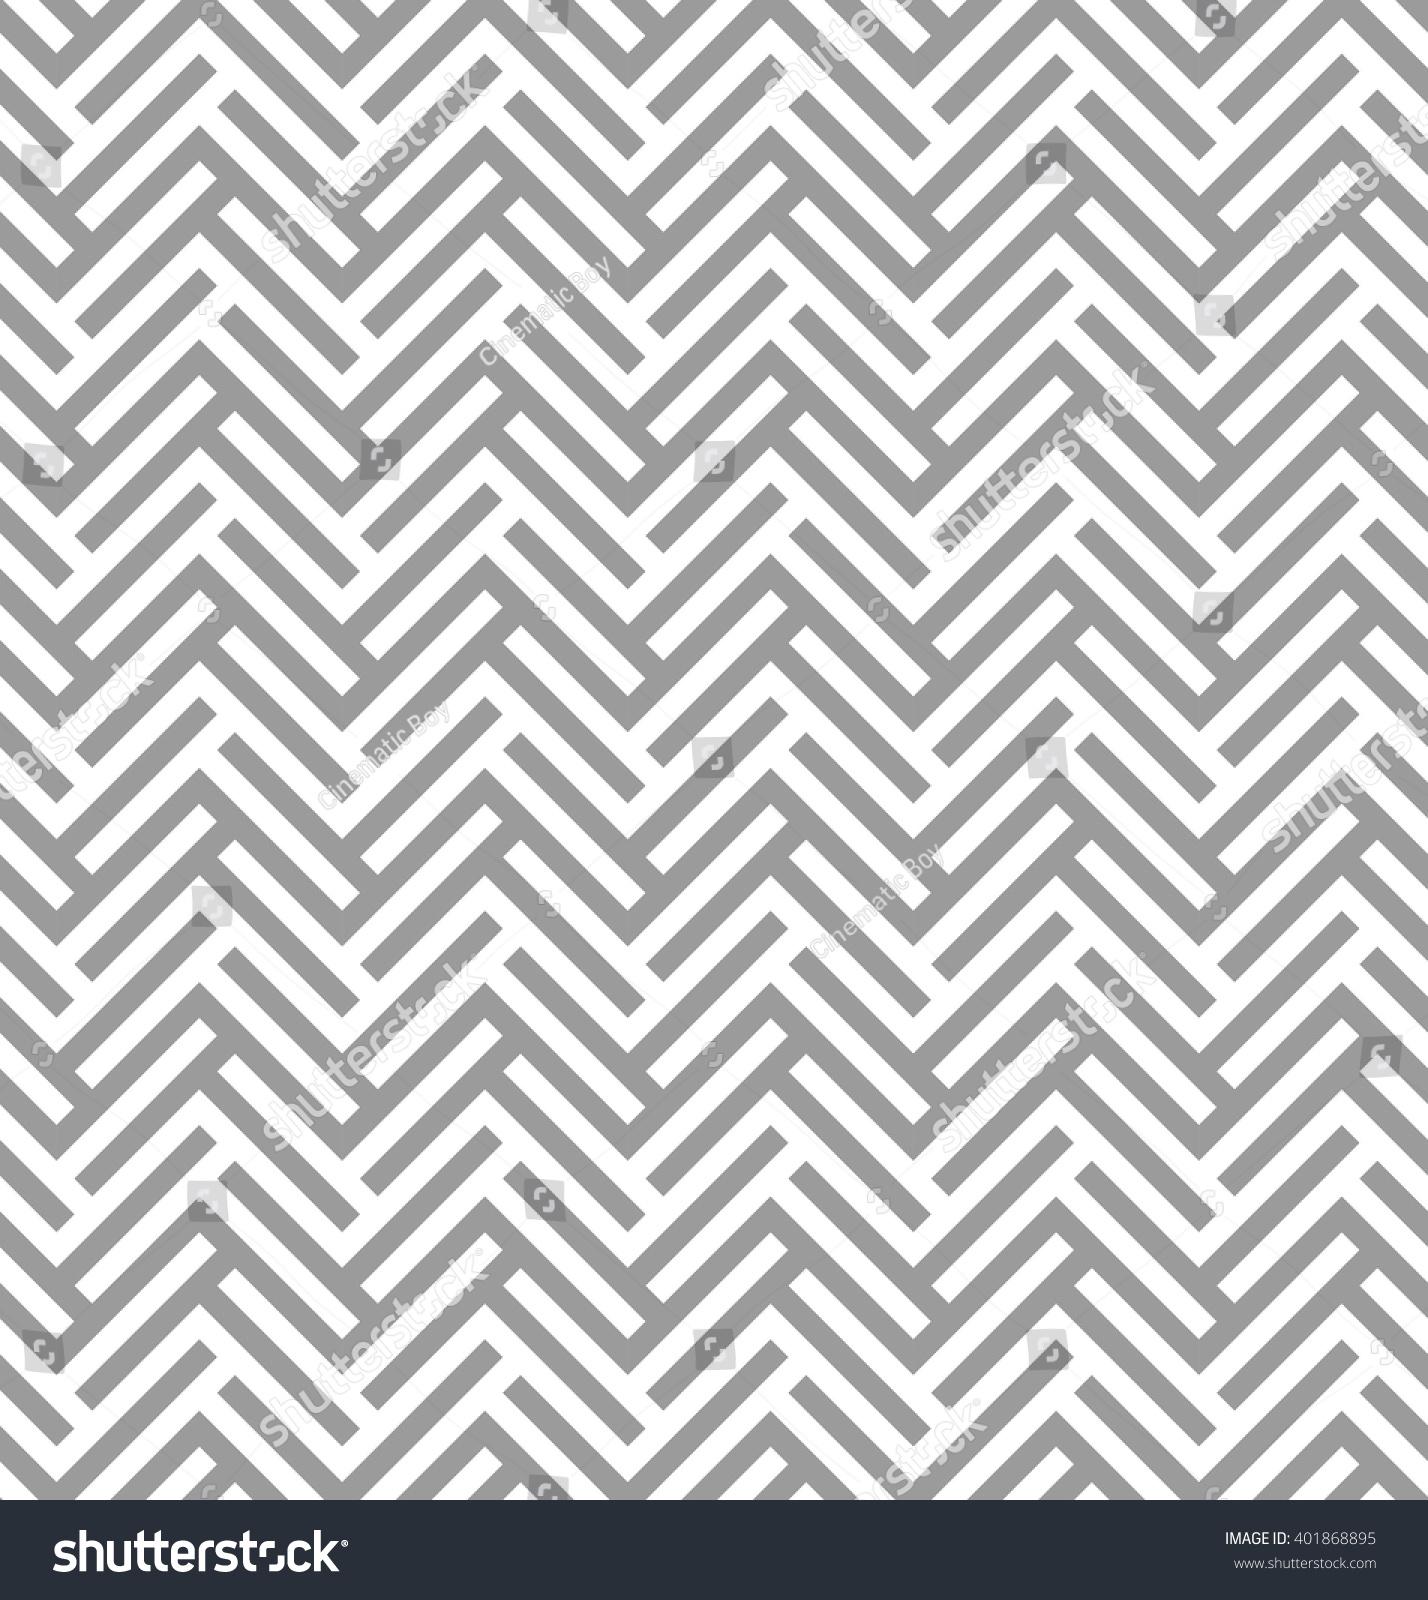 Modern Simple Geometric Fabric Texture Repeating Stock Vector ... for Fabric Texture Pattern Modern  565ane